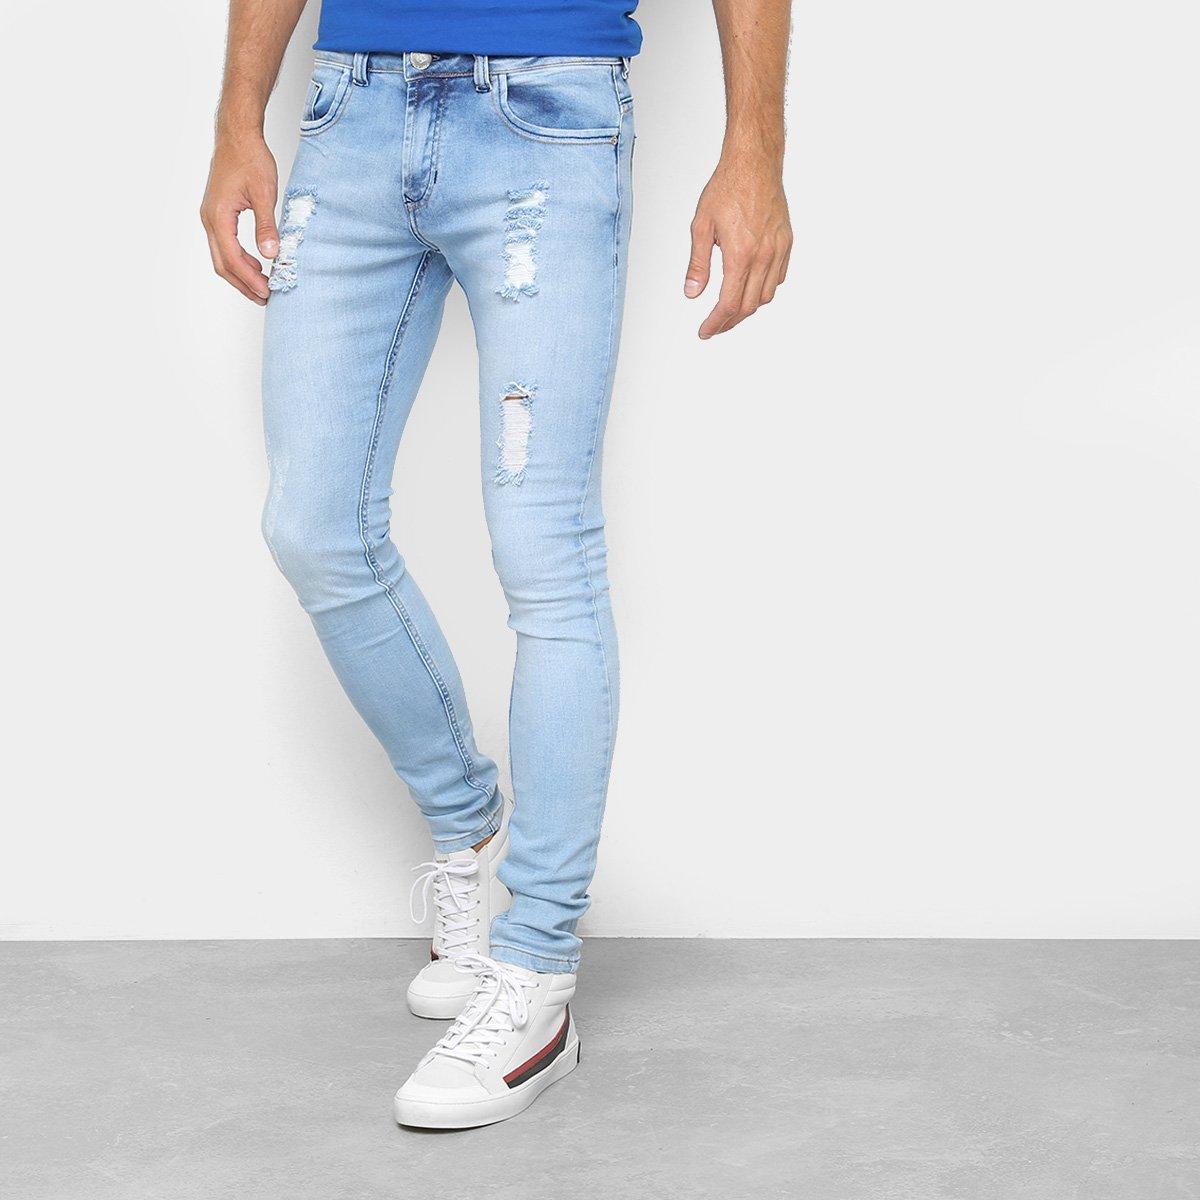 6b7a650eb Calça Jeans Skinny Preston Destroyed Delave Masculina